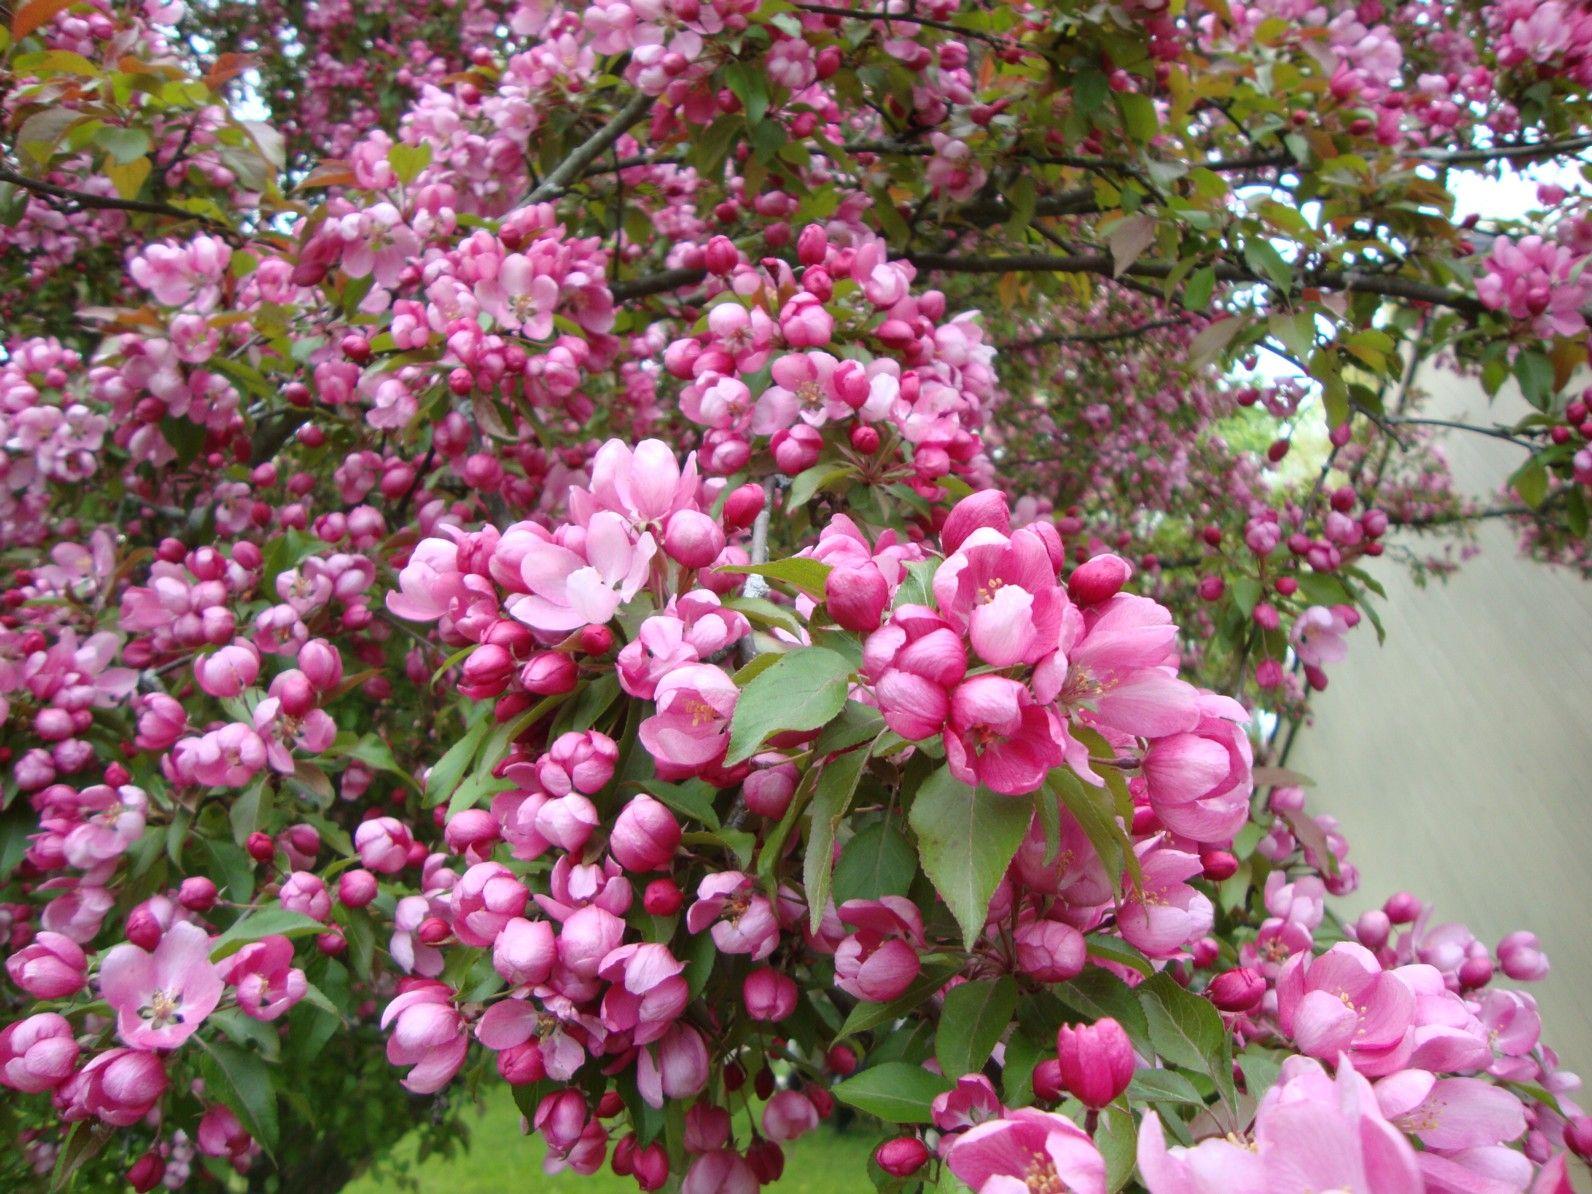 Macintosh Apple Tree Blossoms Apple Flowers Apple Tree Blossoms Trees To Plant